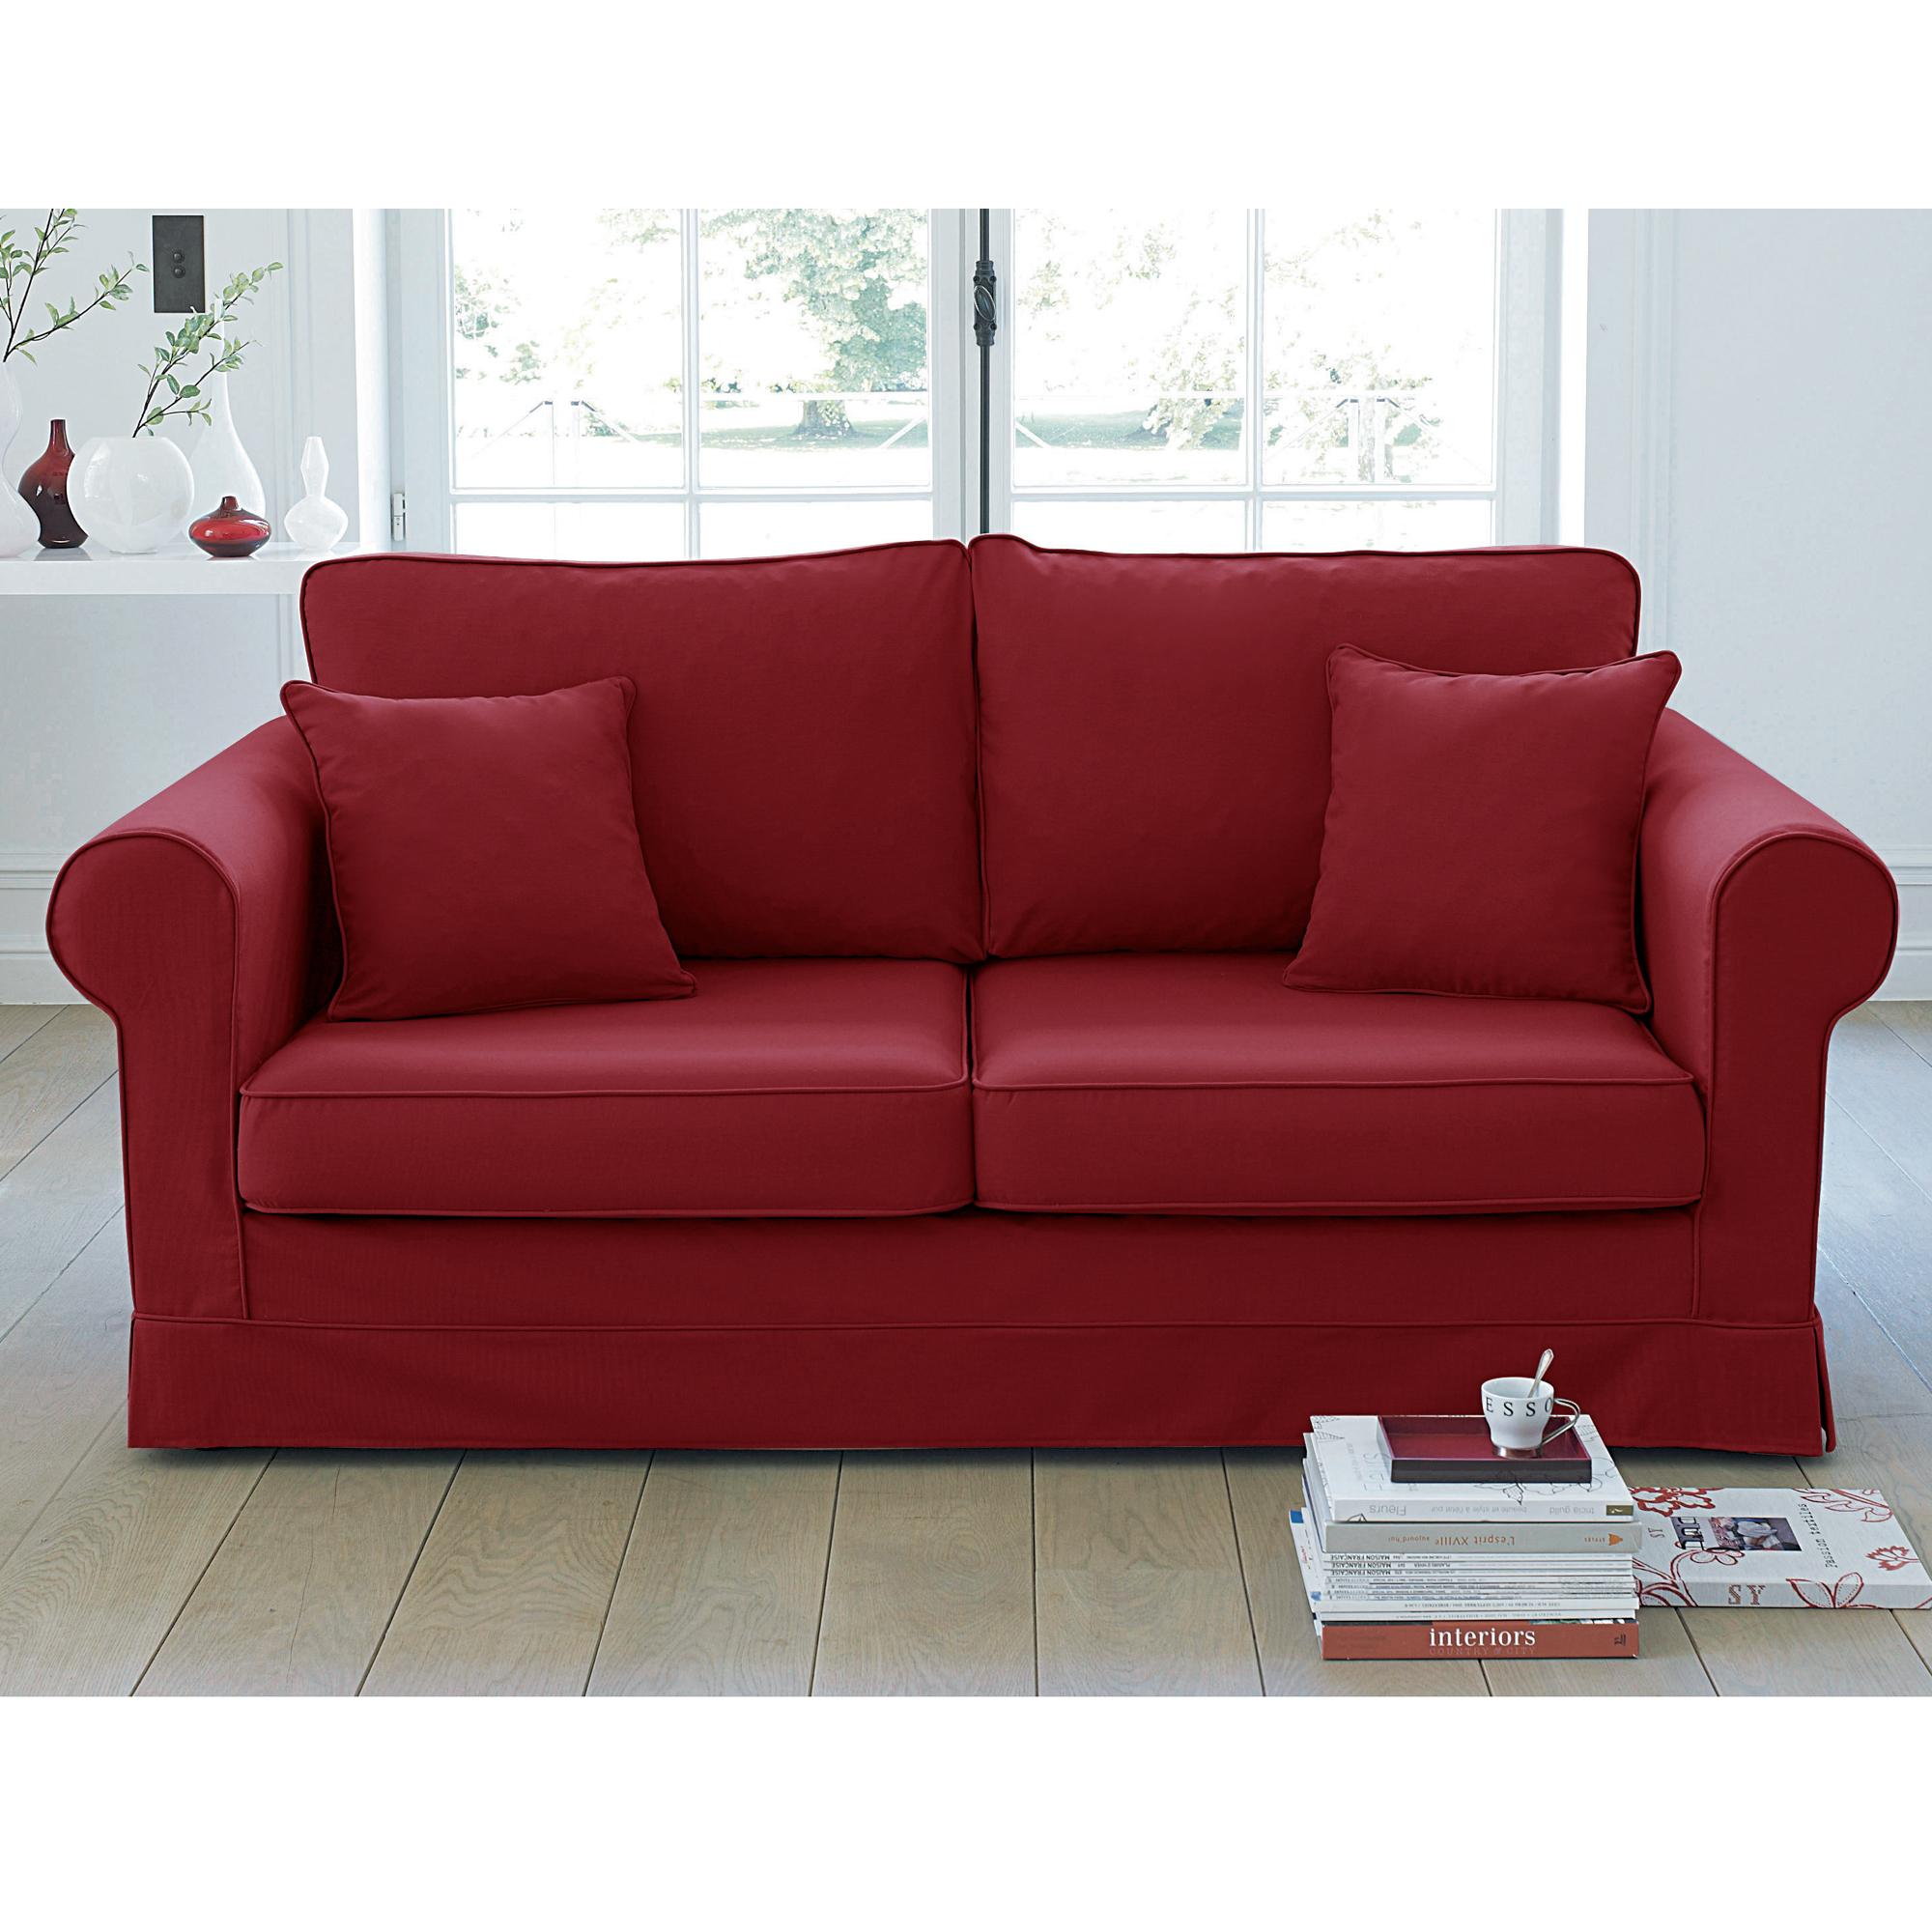 canape convertible bultex. Black Bedroom Furniture Sets. Home Design Ideas